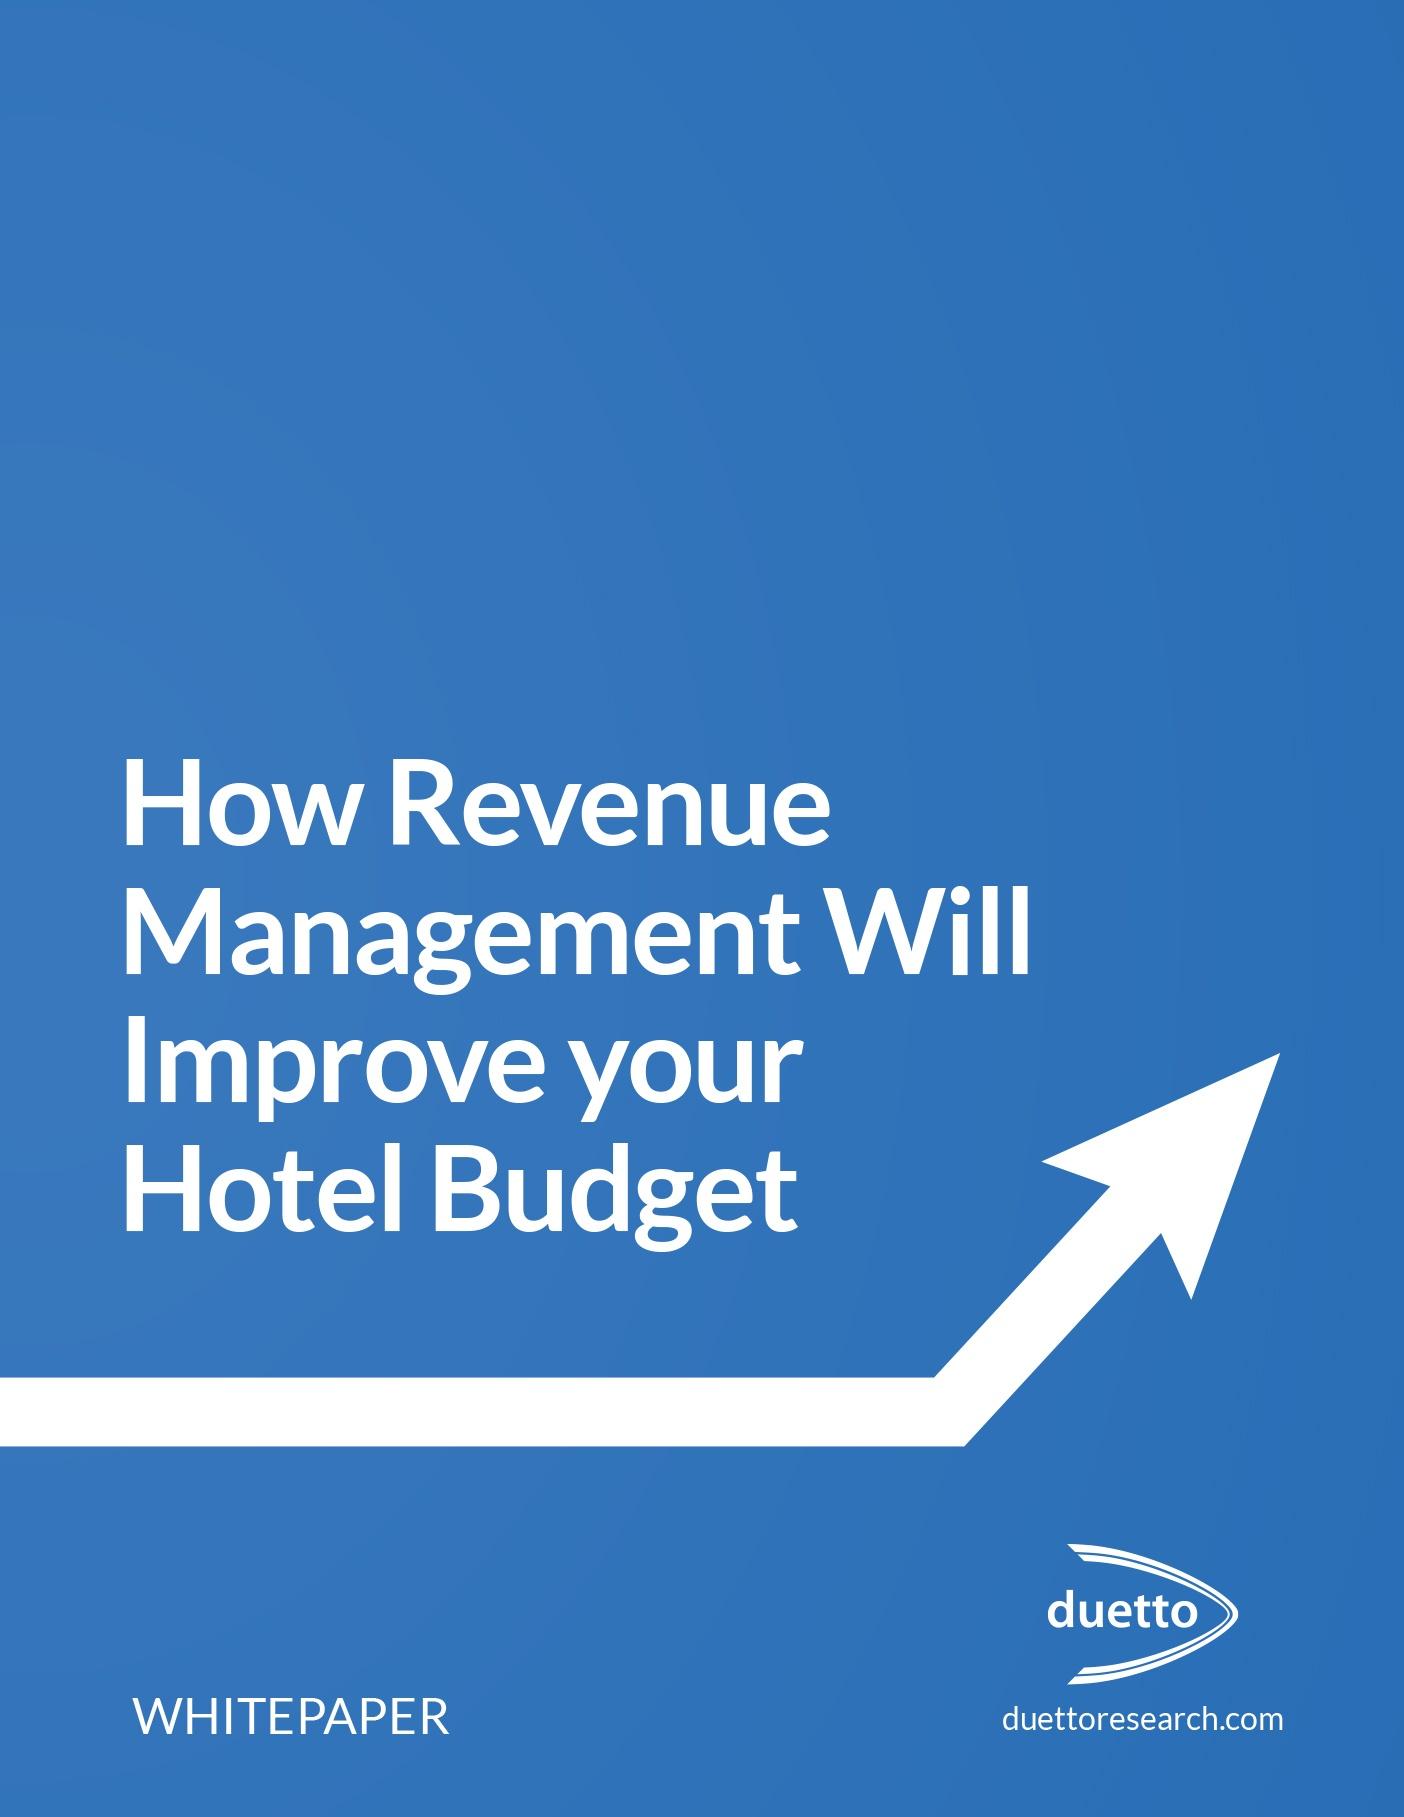 RM Improves Budget 1.jpg